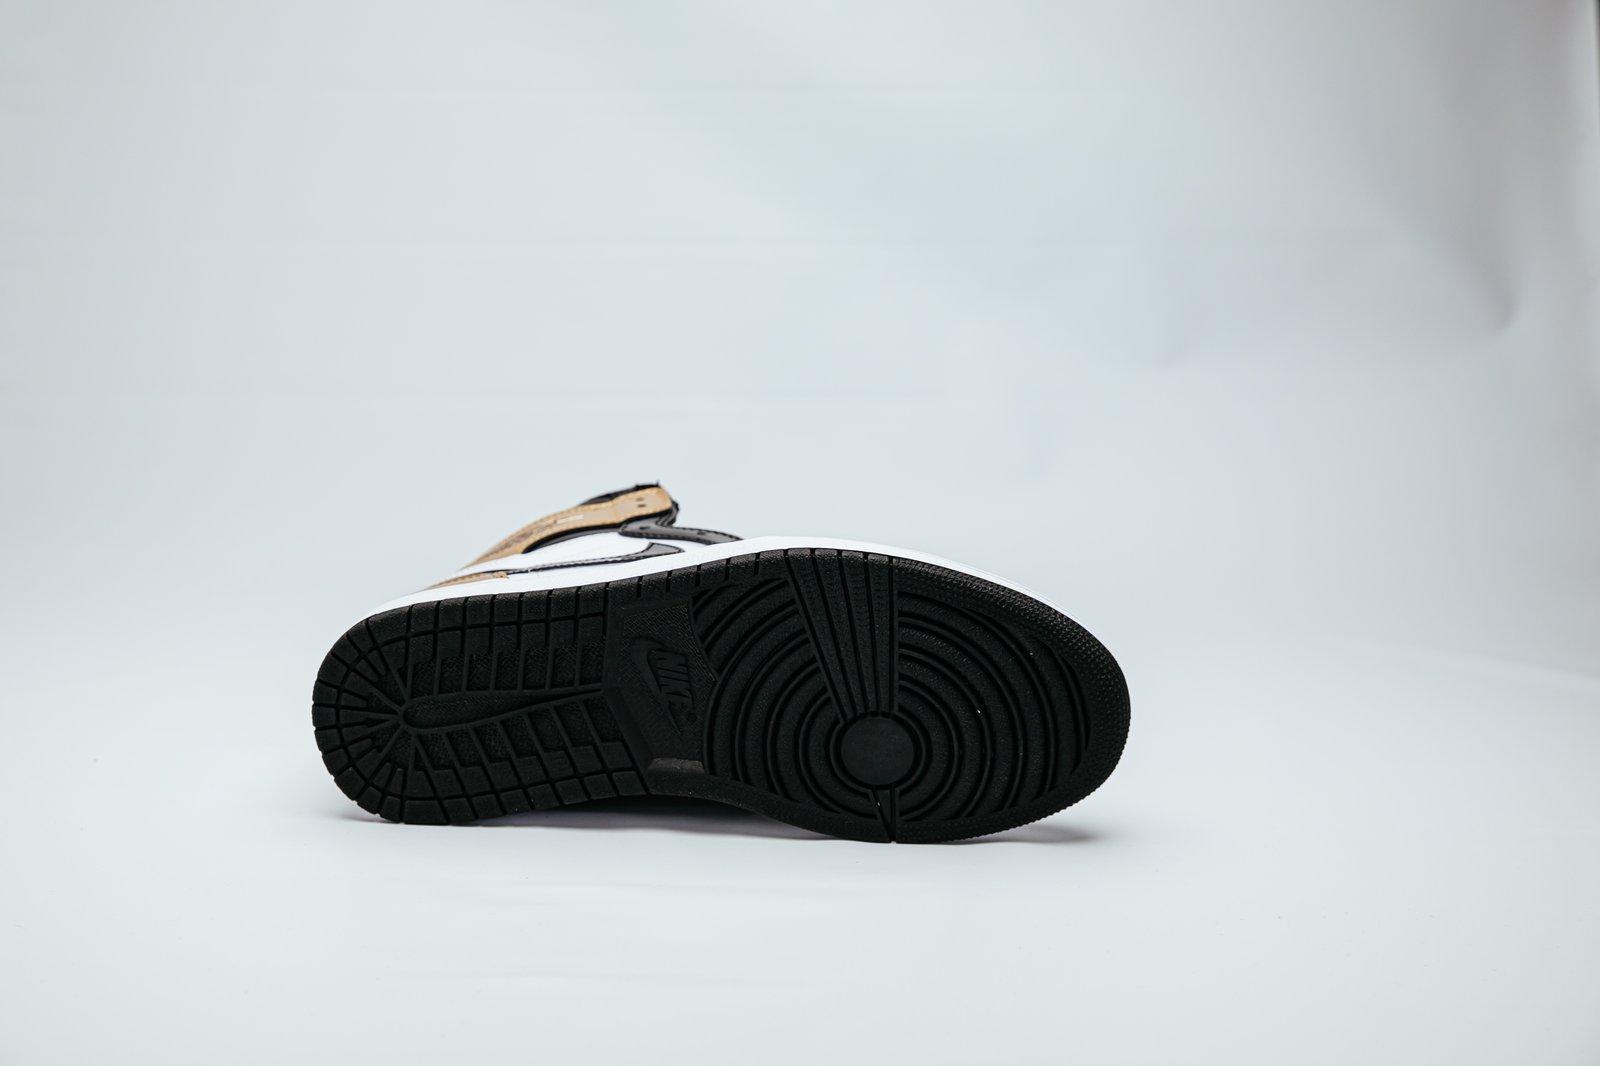 Air Jordan 1 Retro - NRG Gold Toes